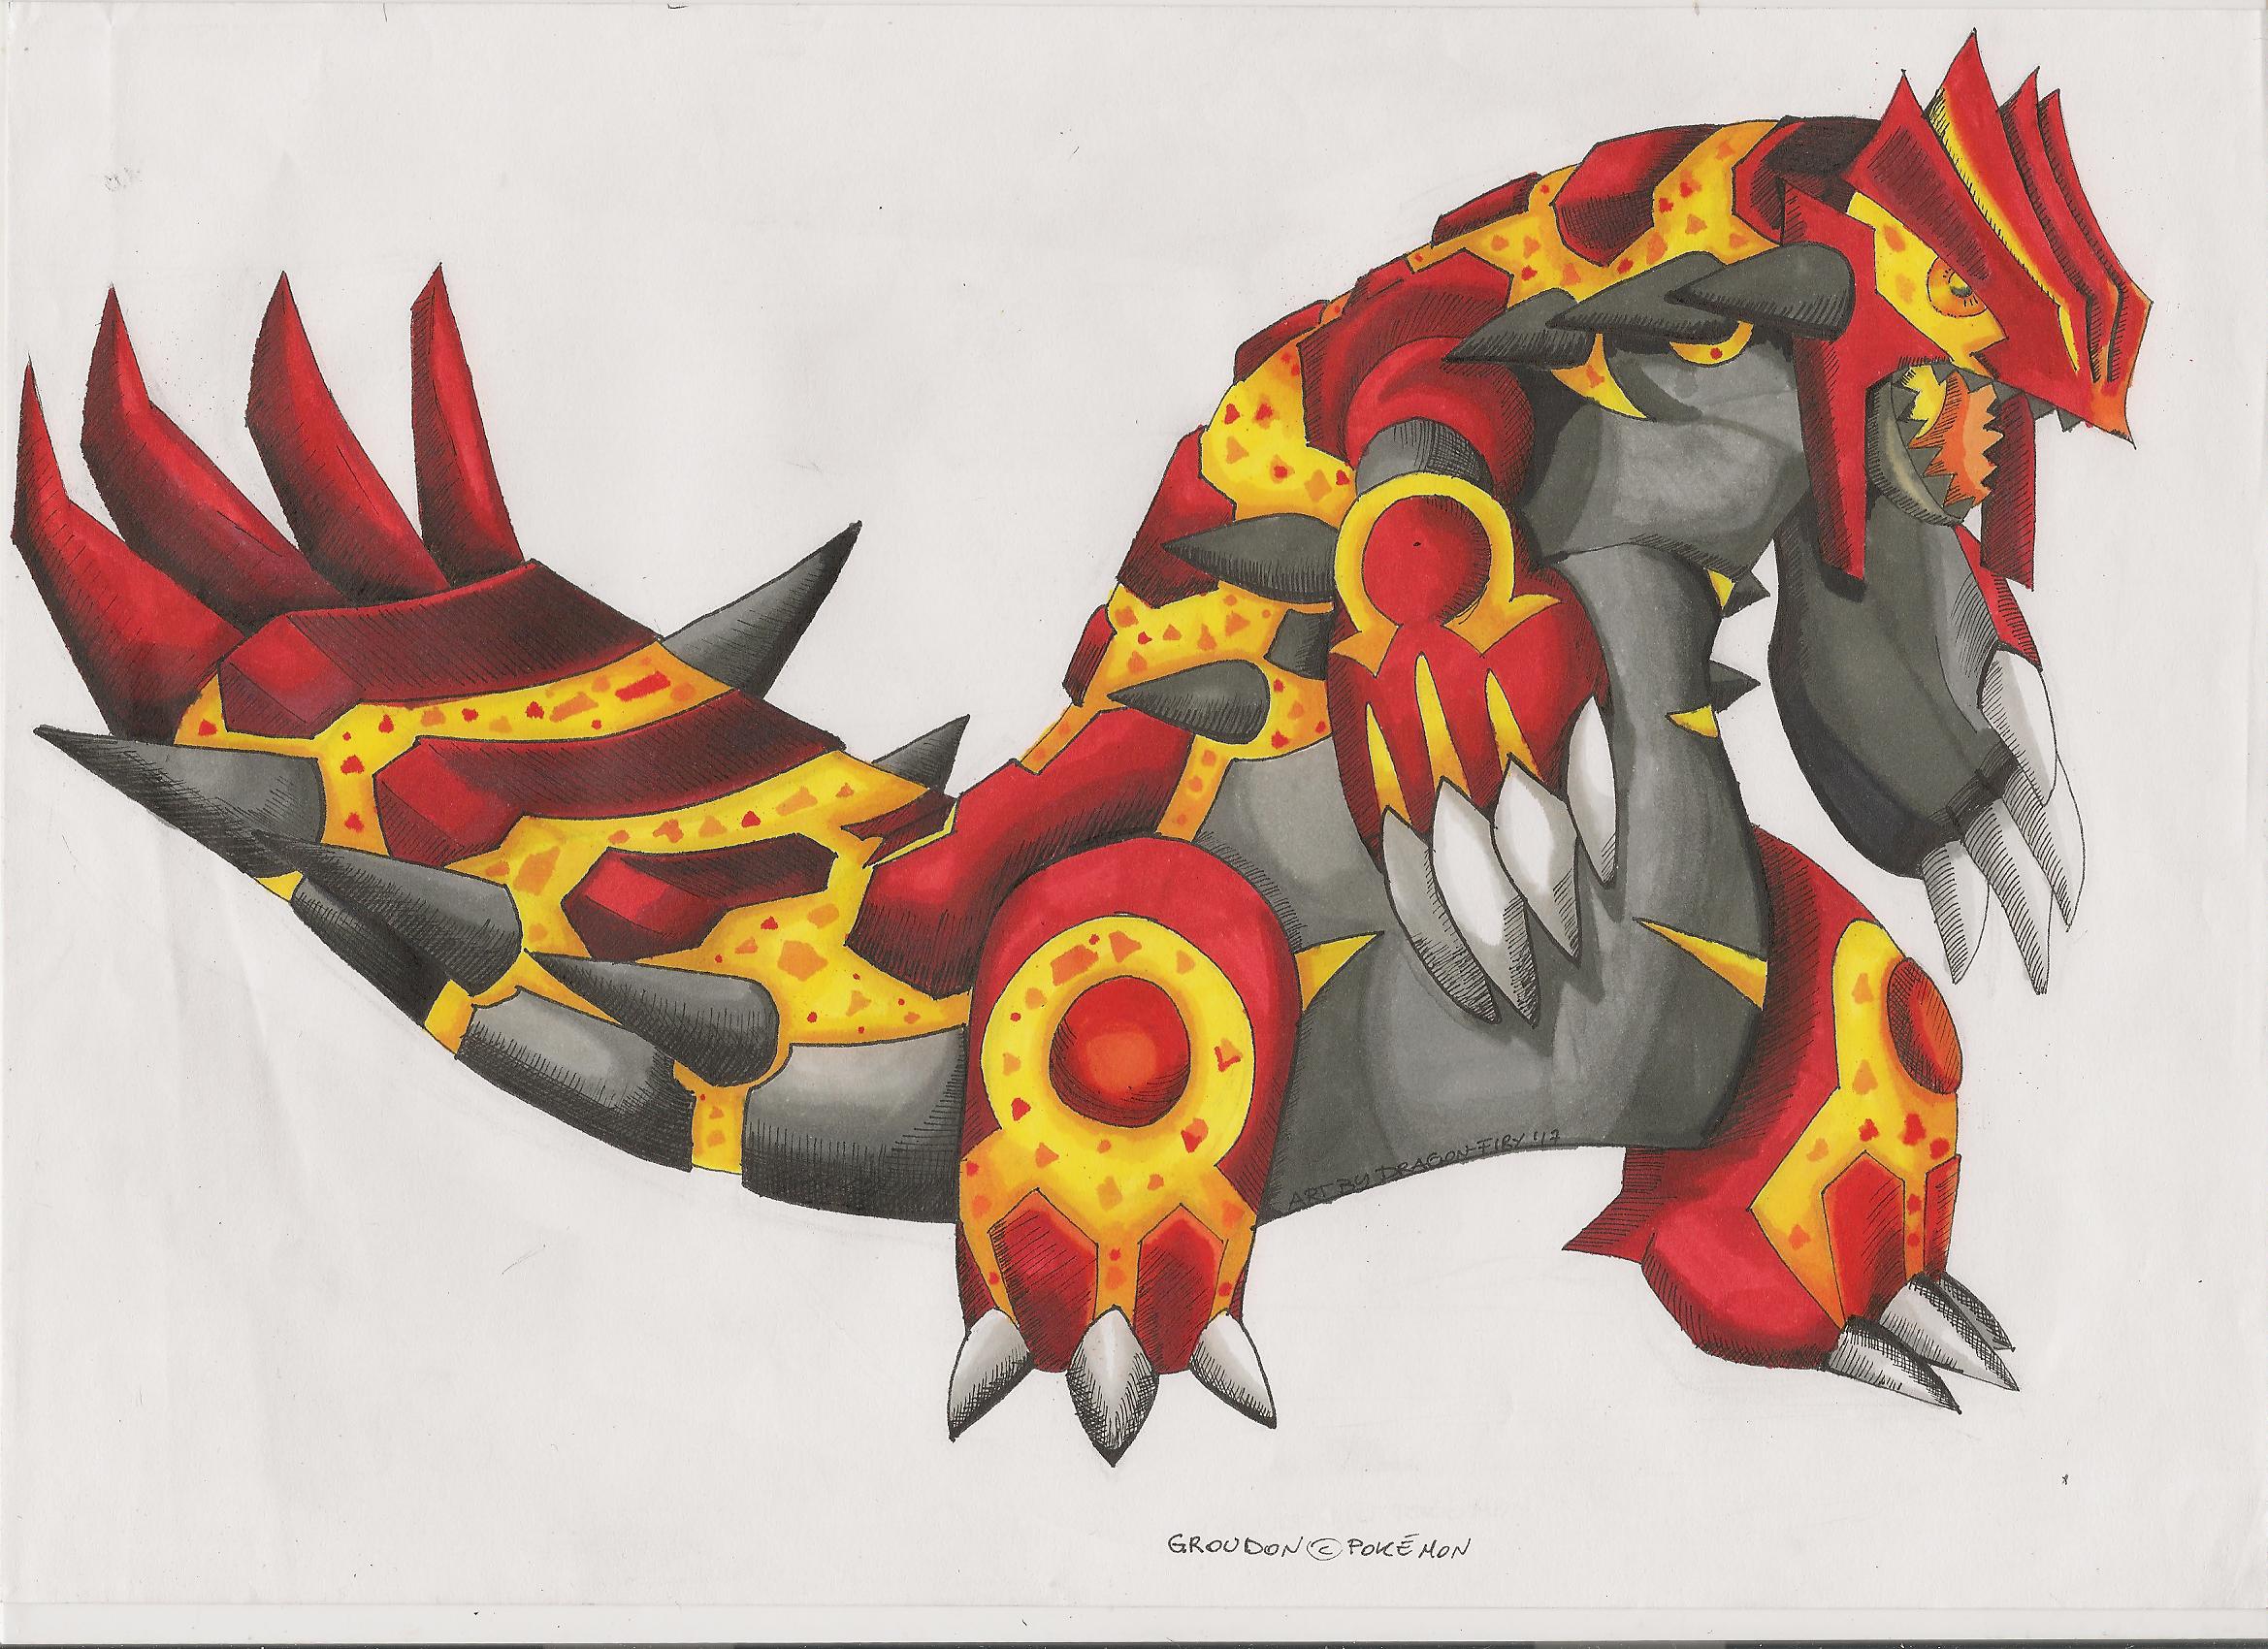 Groudon Primal form - Final [COMMISSION] — Weasyl